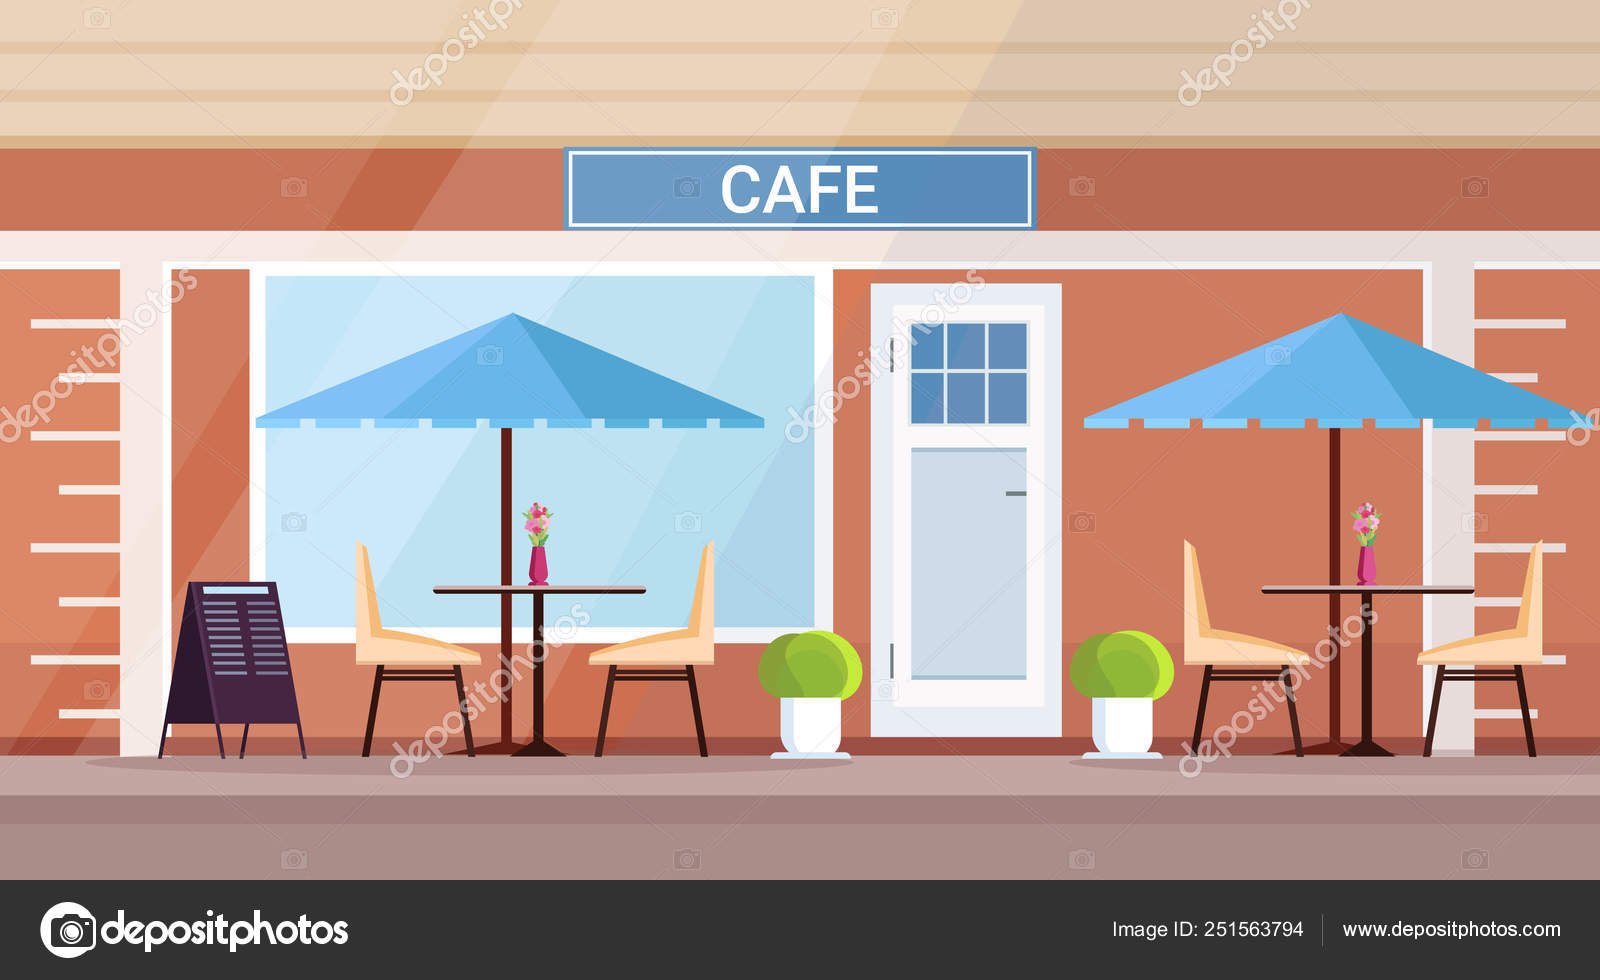 Modern Summer Cafe Shop Exterior Empty No People Street Restaurant Terrace Outdoor Cafeteria Flat Horizontal Stock Vector C Mast3r 251563794